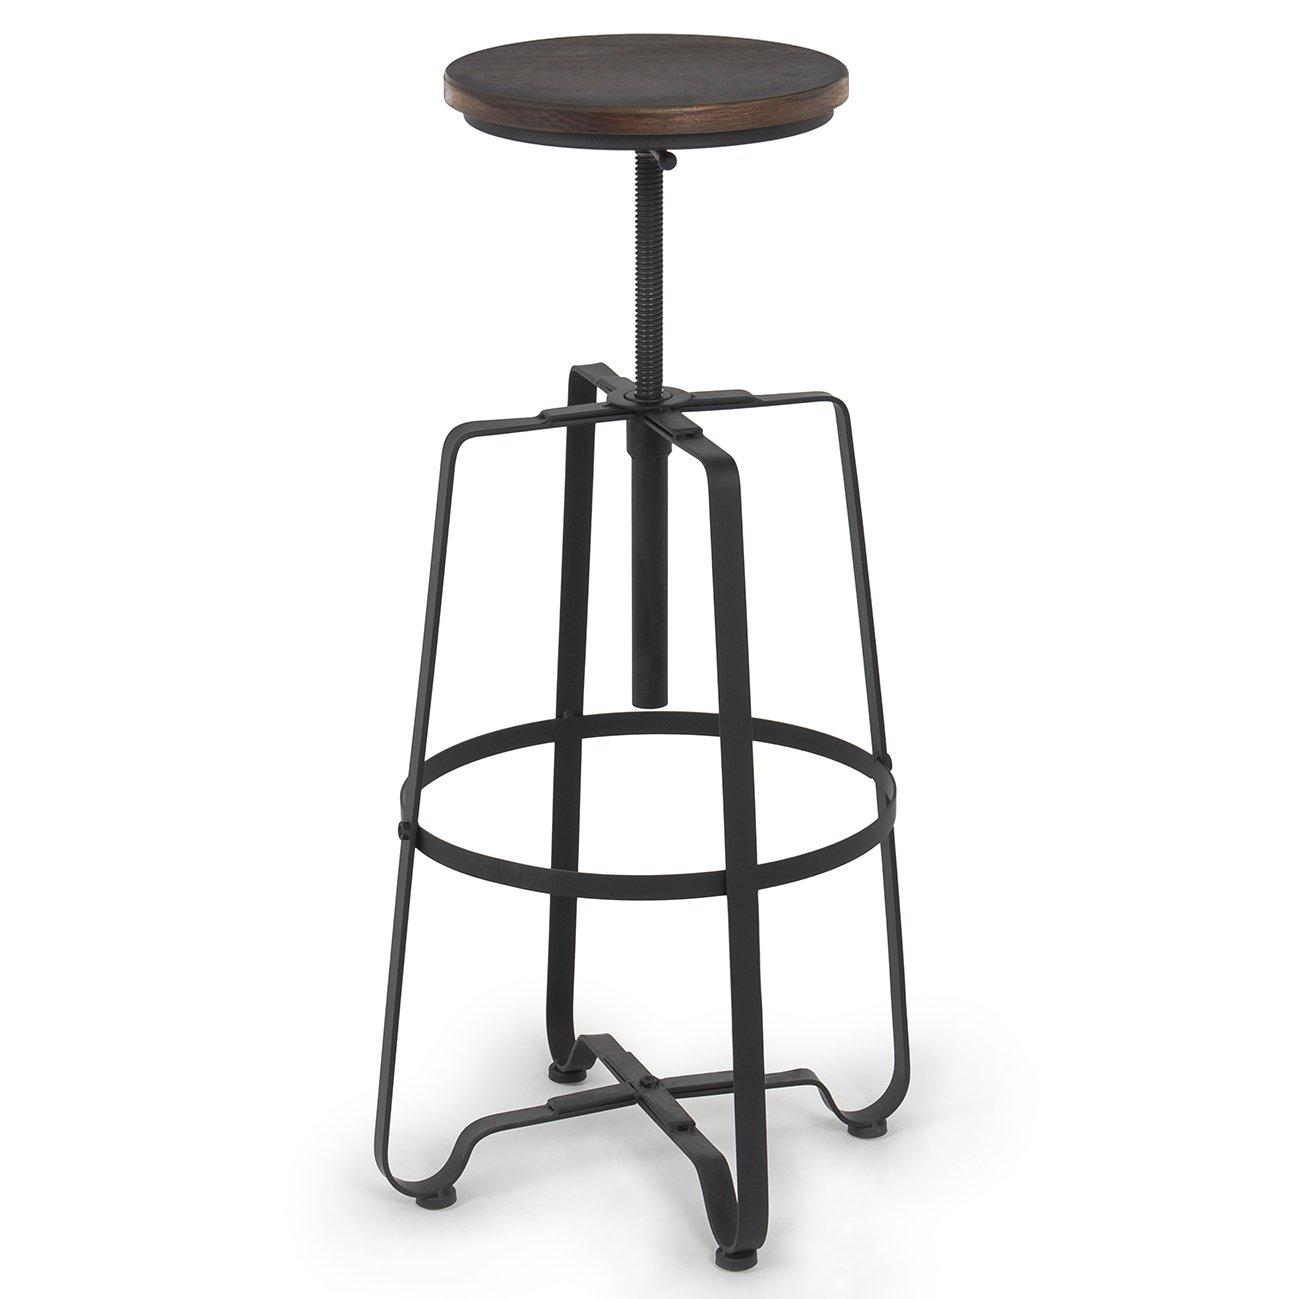 100 Kitchen Bar Stools Counter Height Best Counter  : 611ZTuf2GsLSL1299 from oyuncacocuk.com size 1299 x 1299 jpeg 76kB